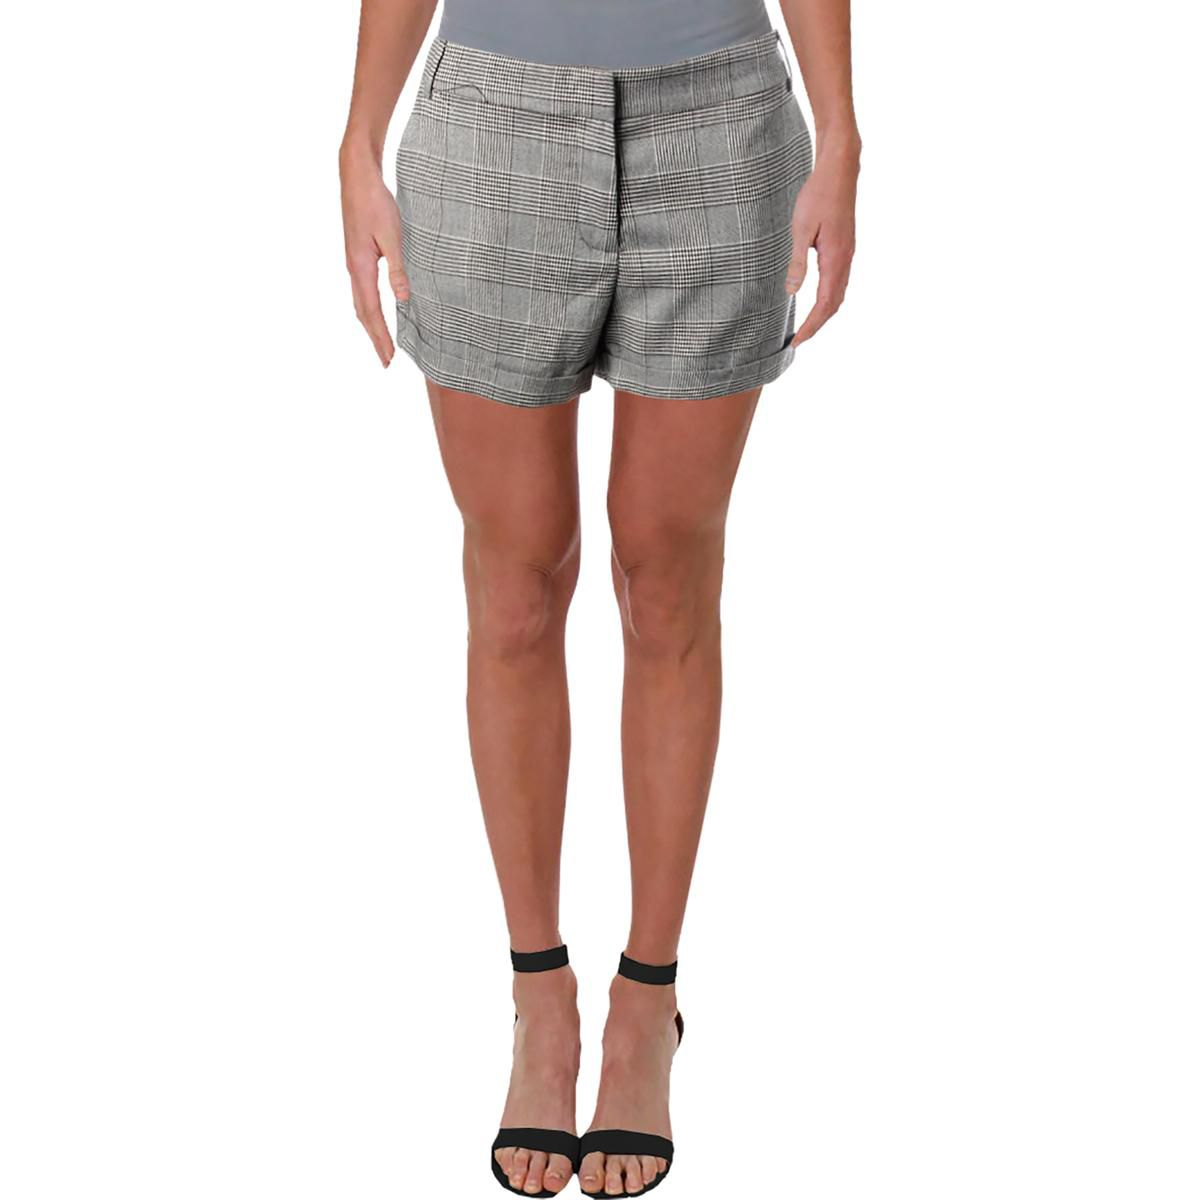 Aqua Womens Dress Shorts Black-White Size Small